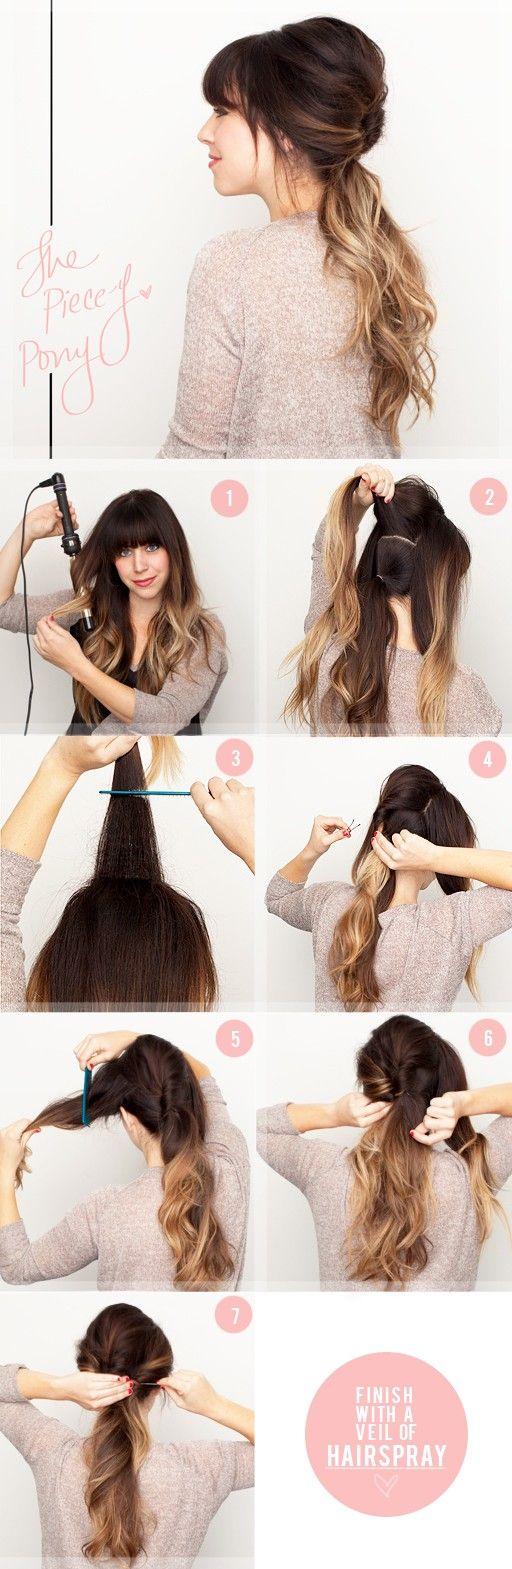 wish my hair would do this!Hair Colors, Hair Tutorials, Ombre Hair, Long Hair, Hair Style, Pony Tails, Ponytail Hairstyles, Summer Hairstyles, Ponies Tail